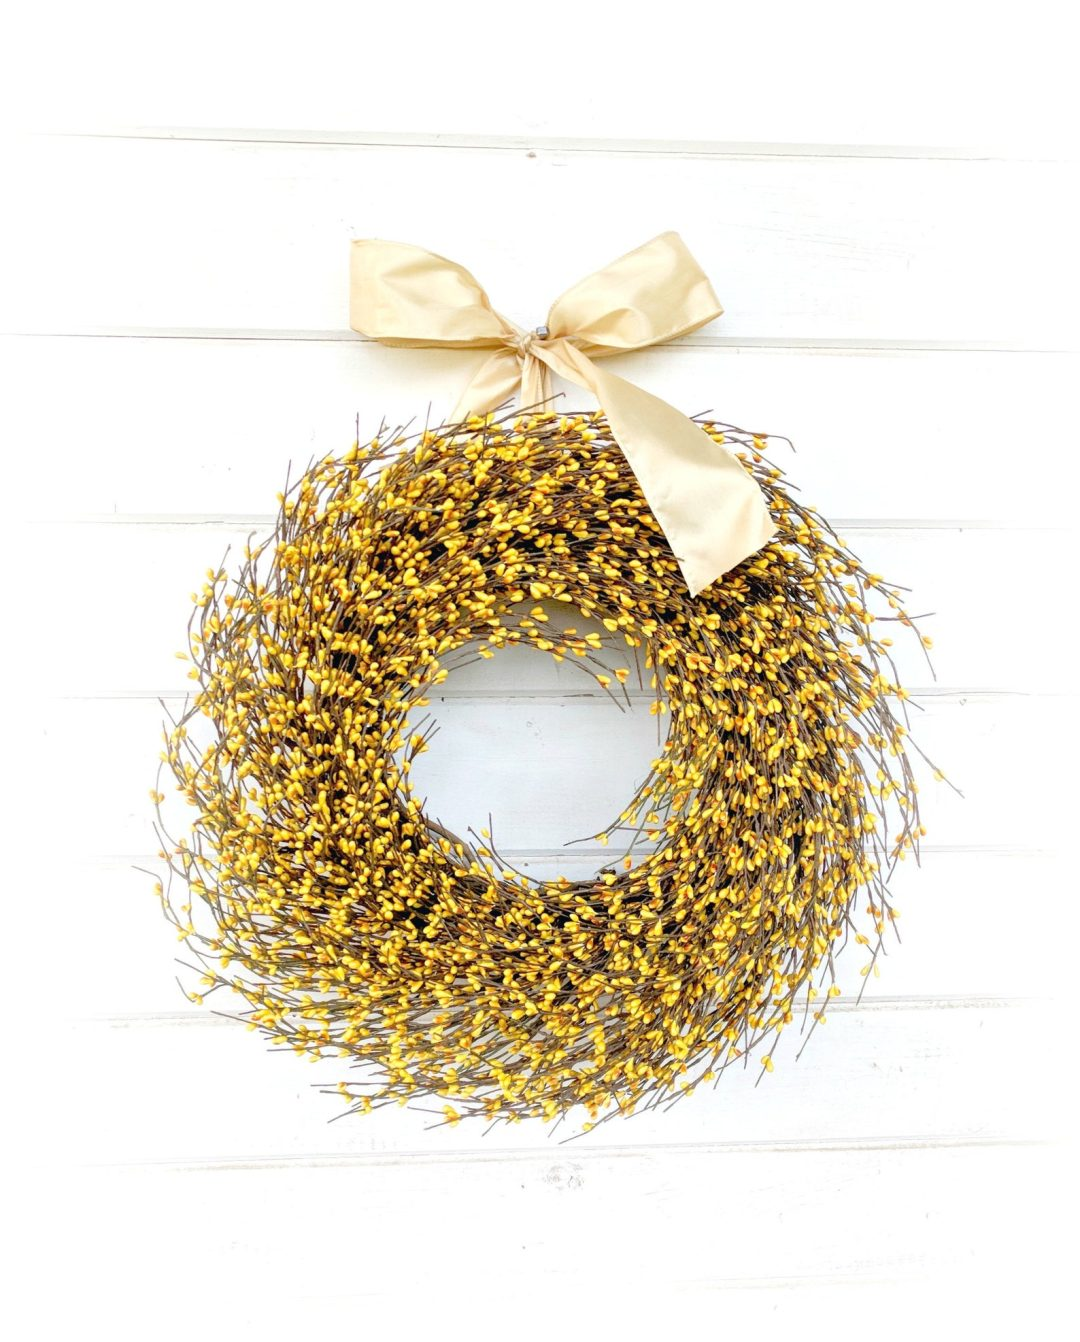 Best fall wreaths for front door, farmhouse fall wreaths